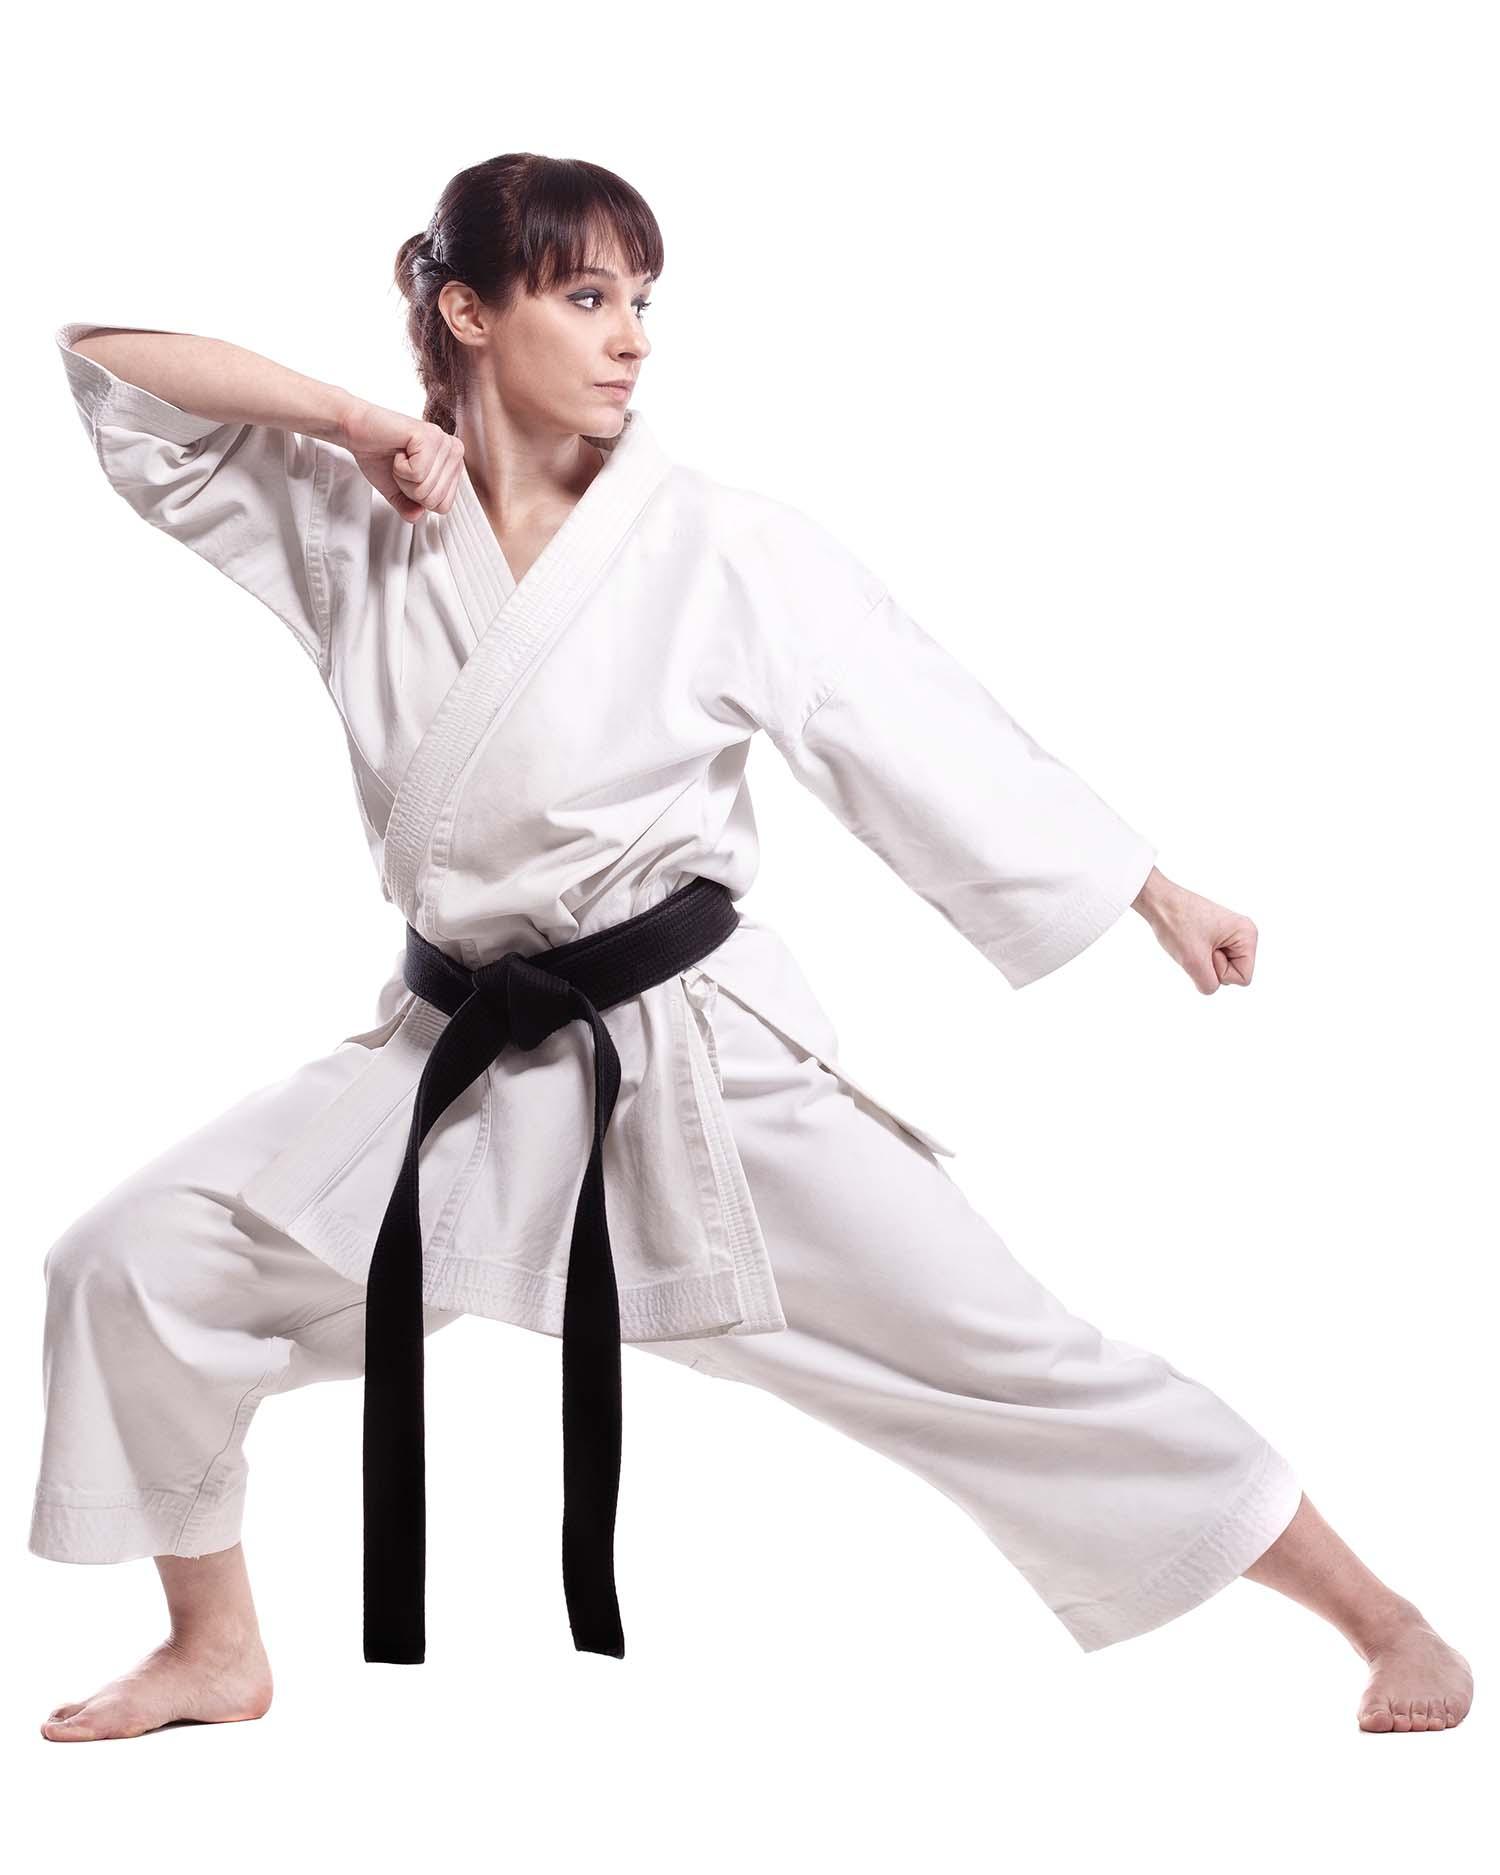 images Martial arts